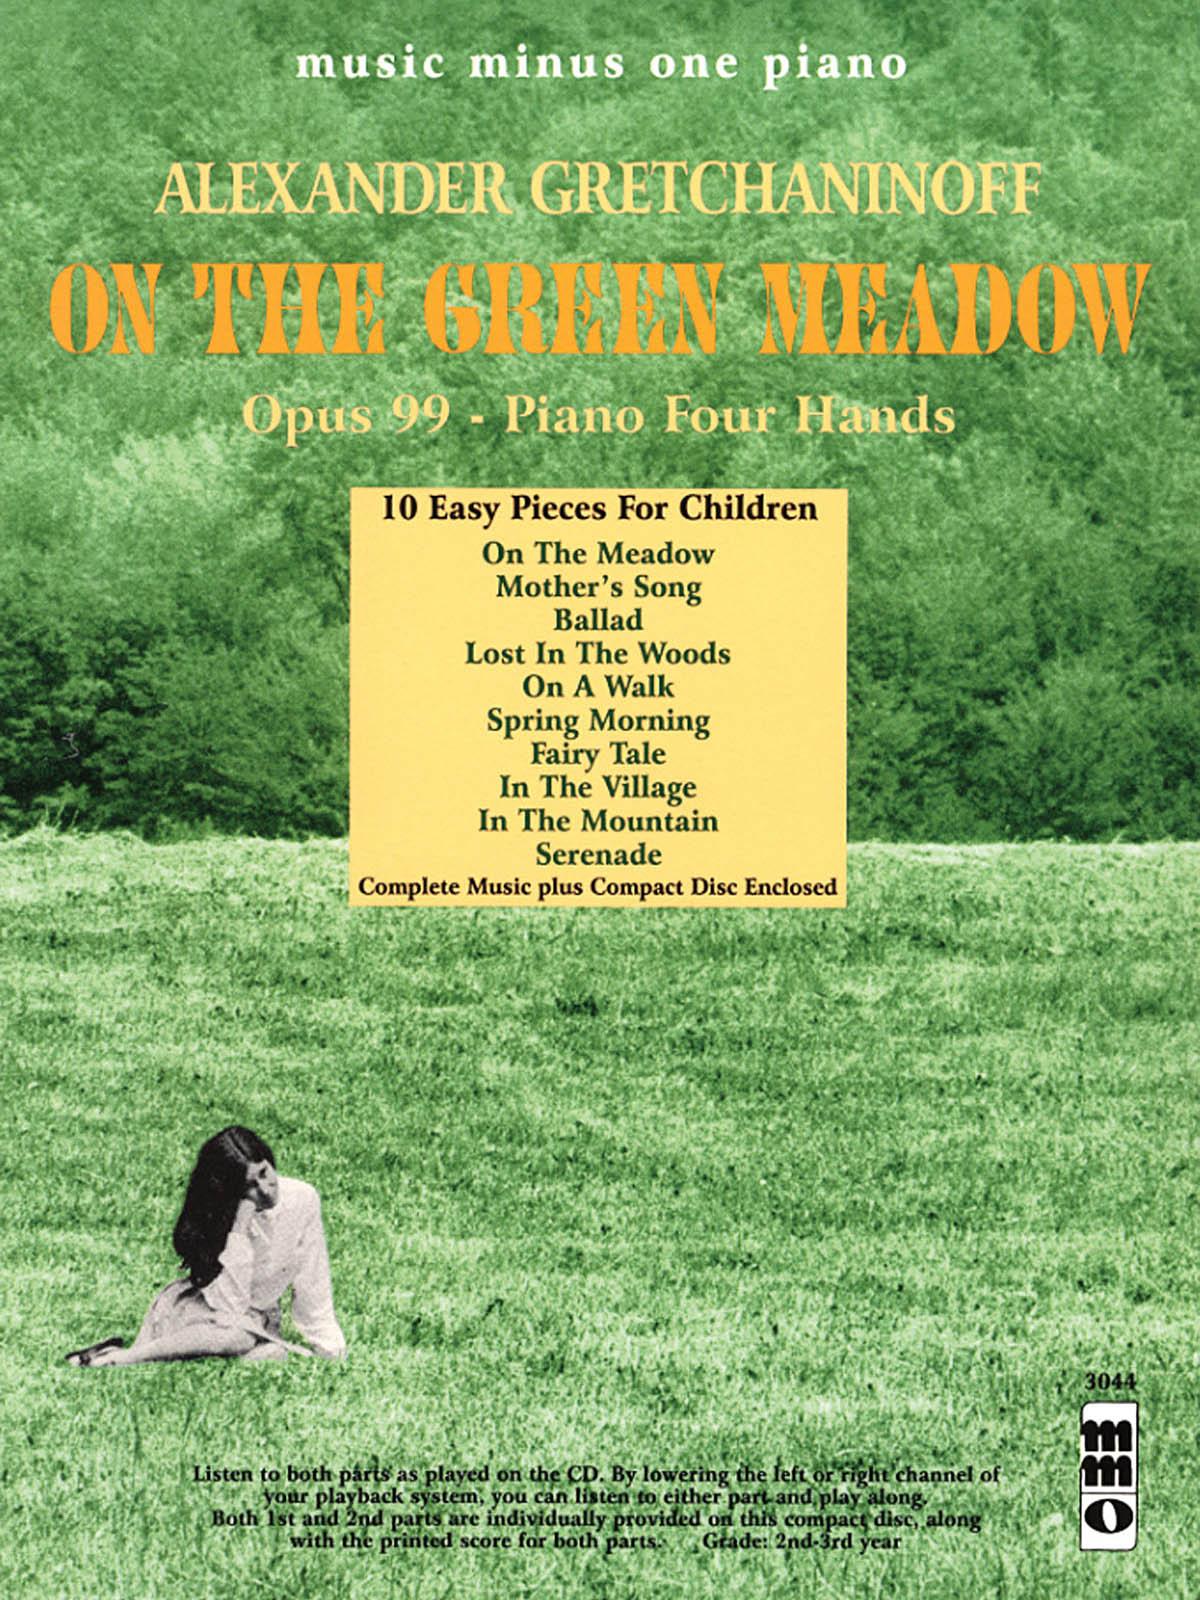 Alexander T. Gretchaninov: Alexander Gretchaninoff - On the Green Meadow: Piano